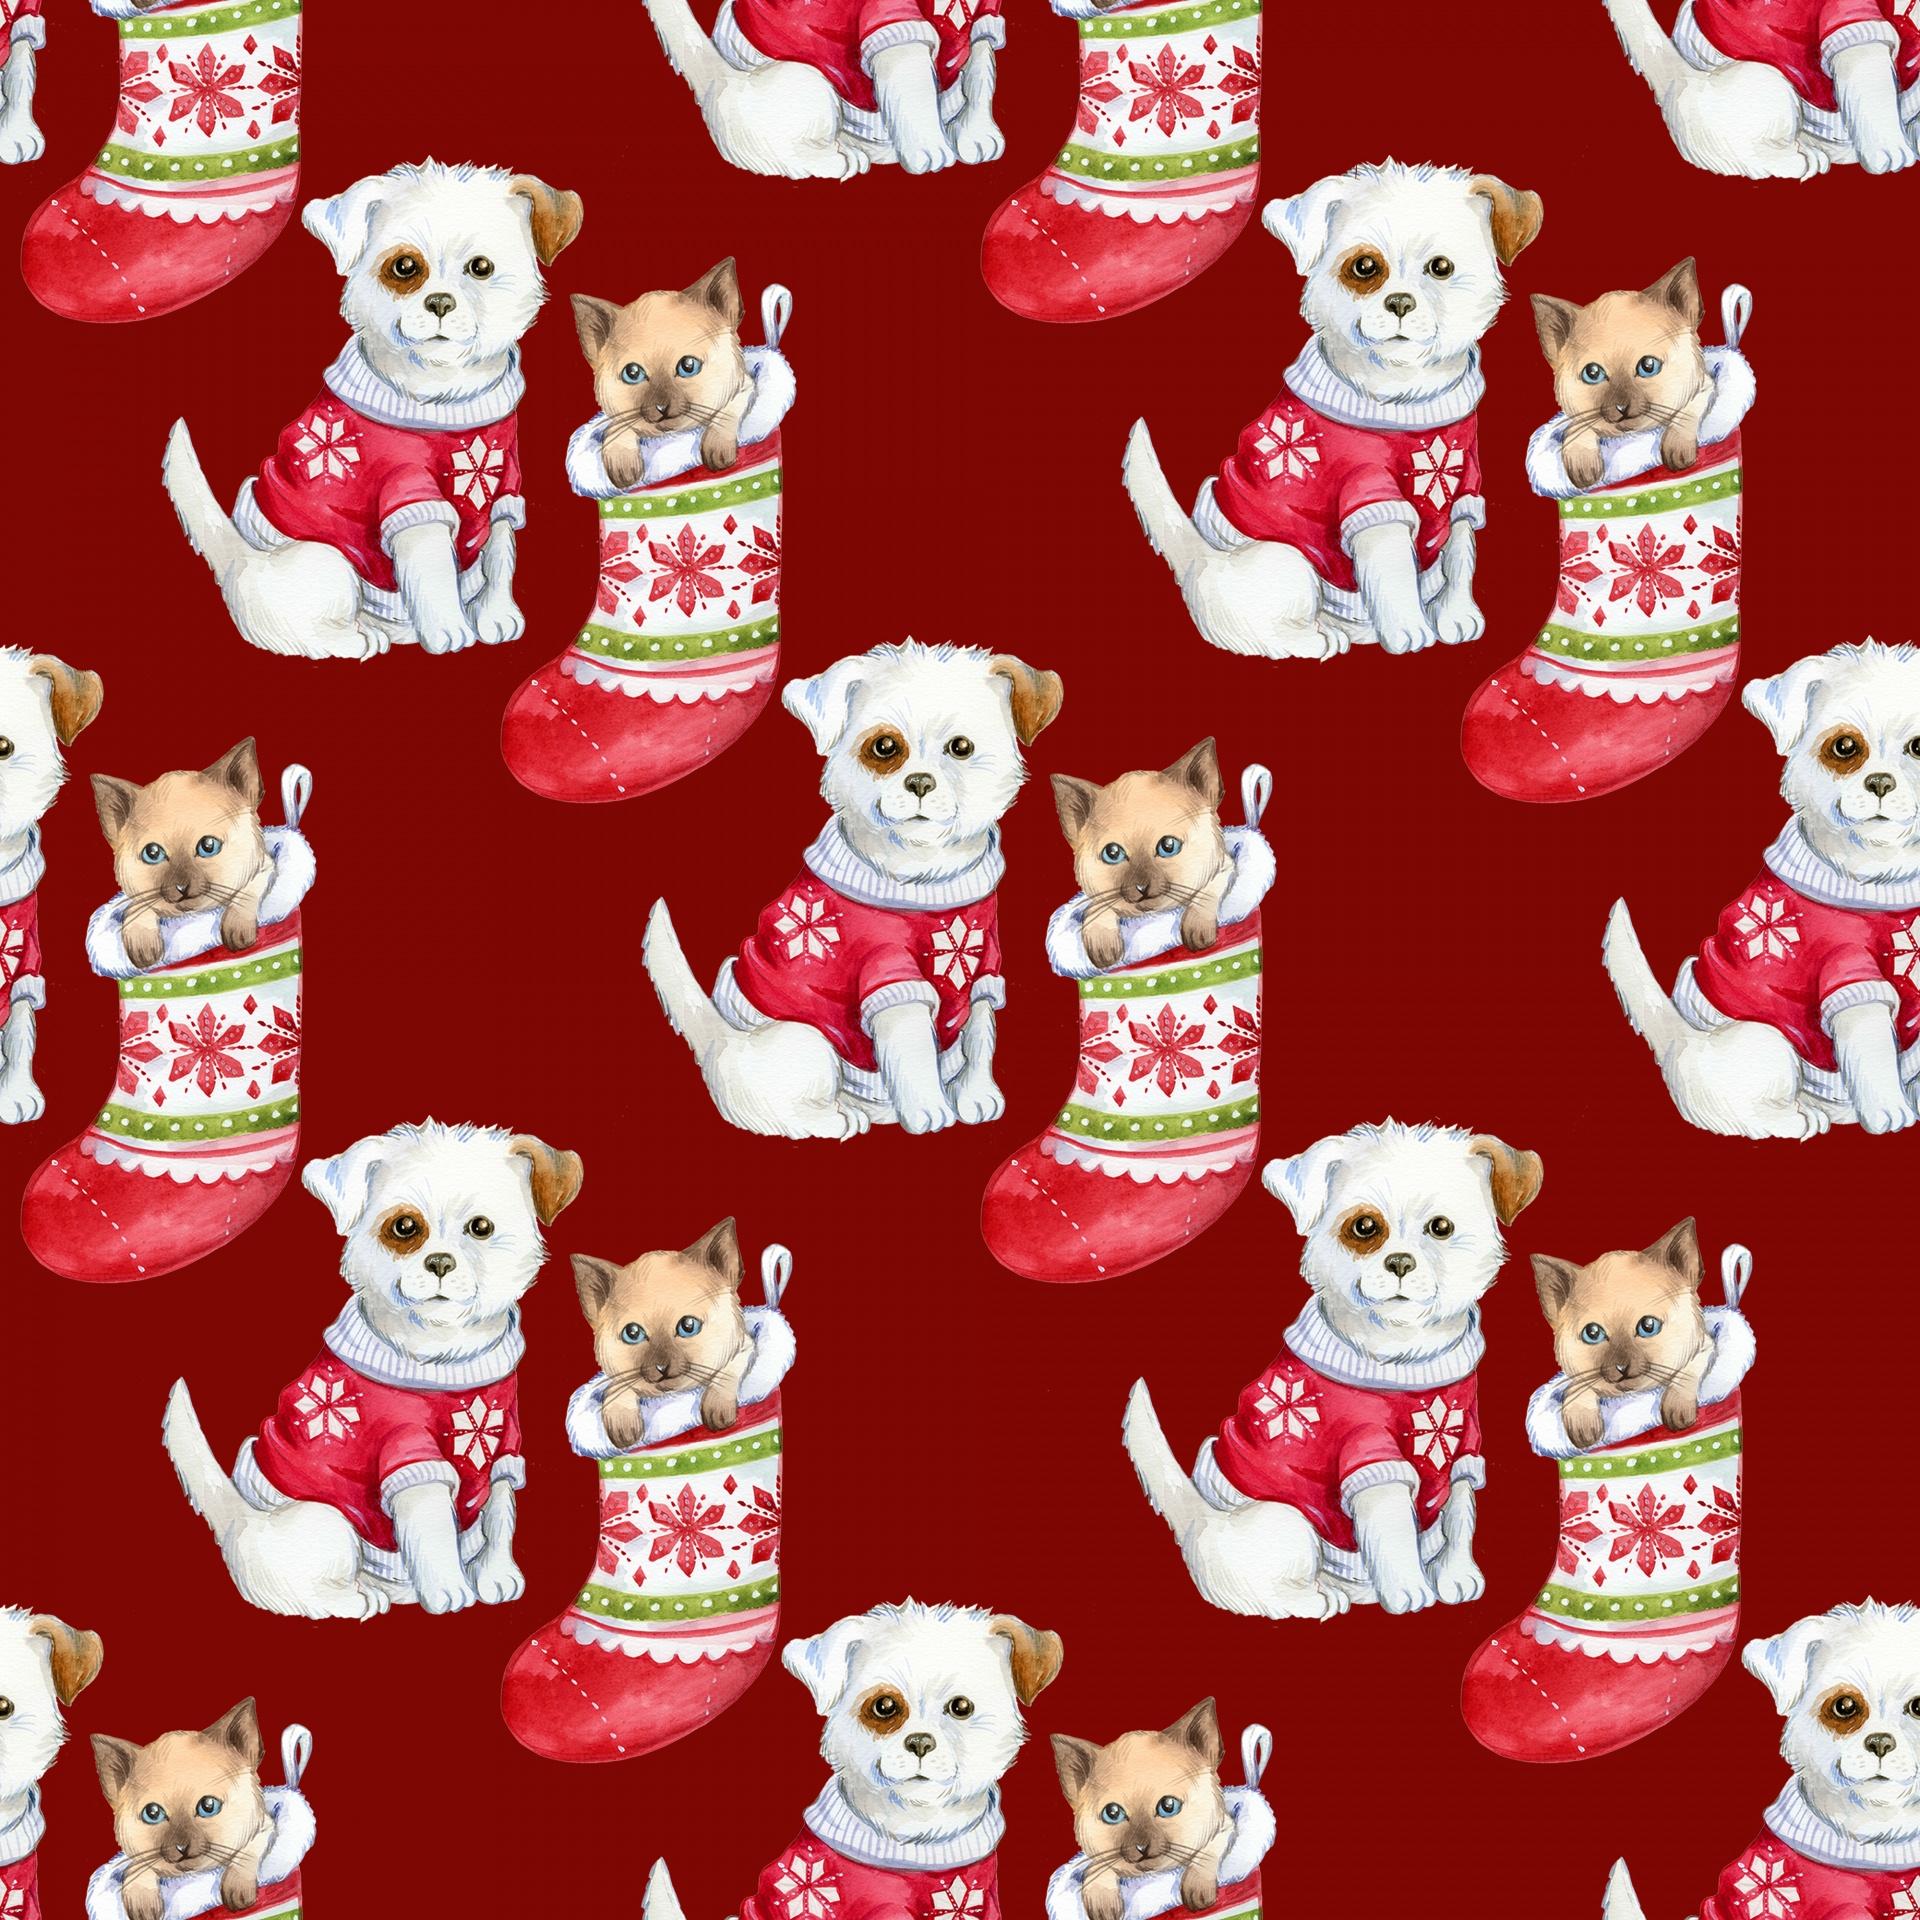 Christmas Puppy Kitten Free Photo Christmas Puppies Cartoon 1920x1920 Wallpaper Teahub Io